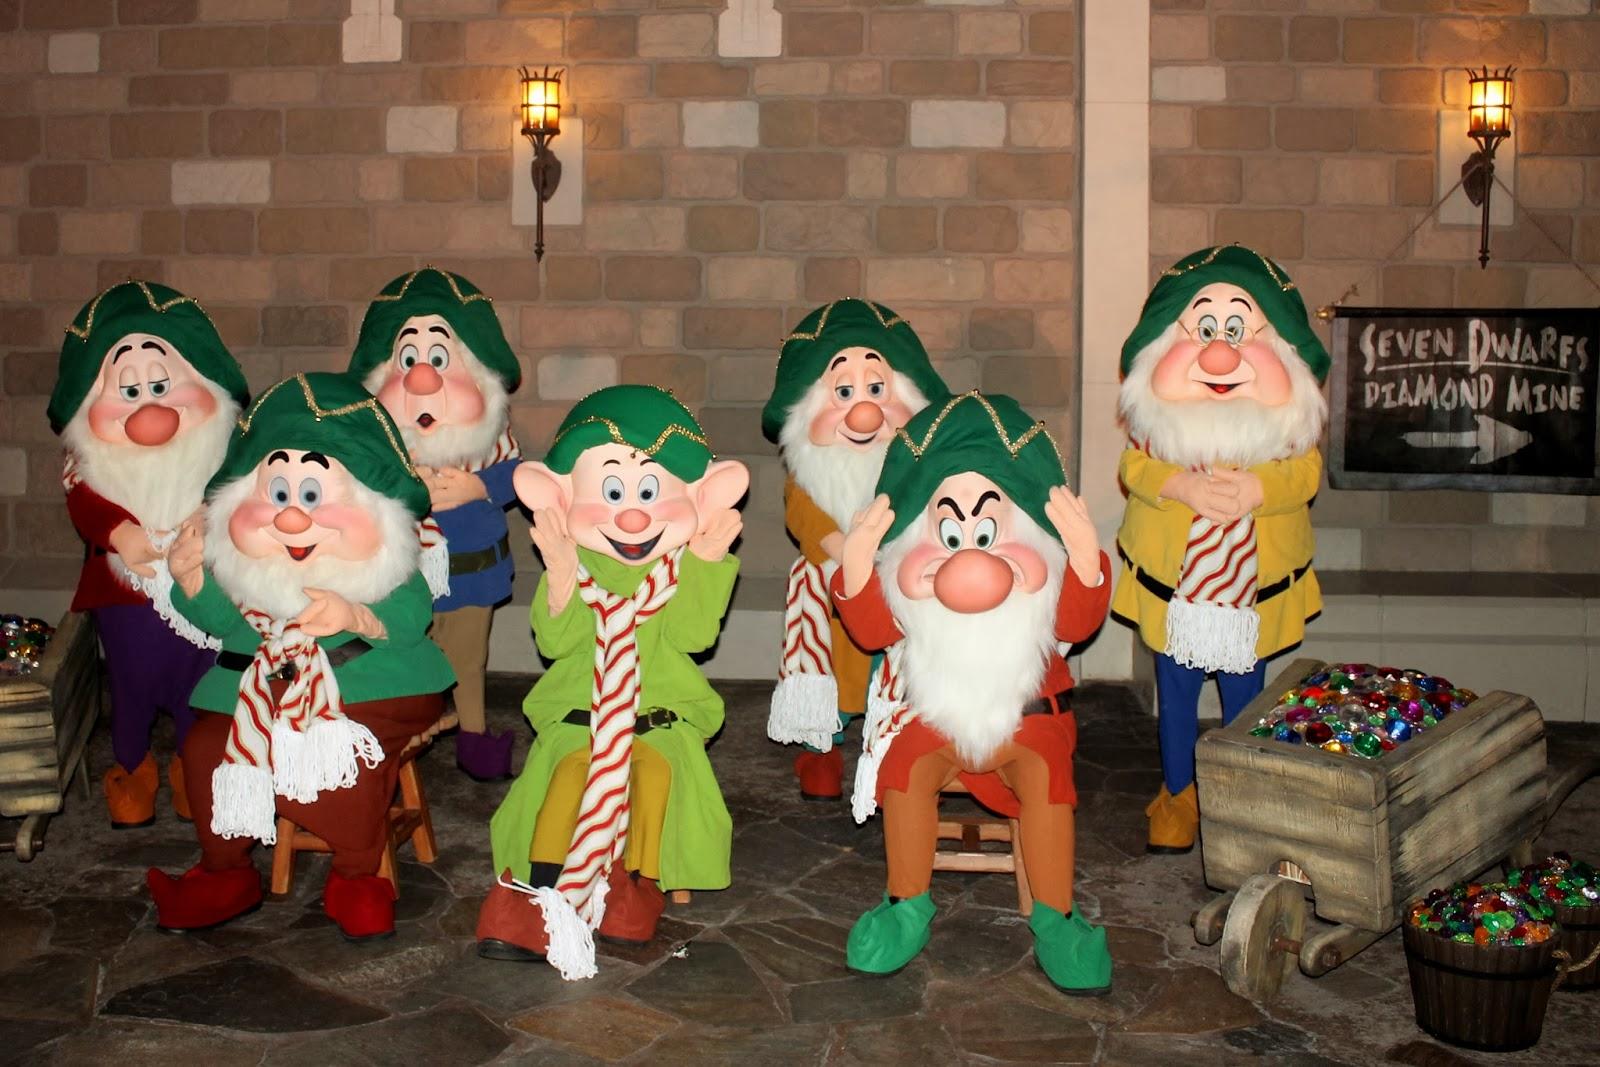 mickeys very merry christmas party - Disney Christmas Party 2015